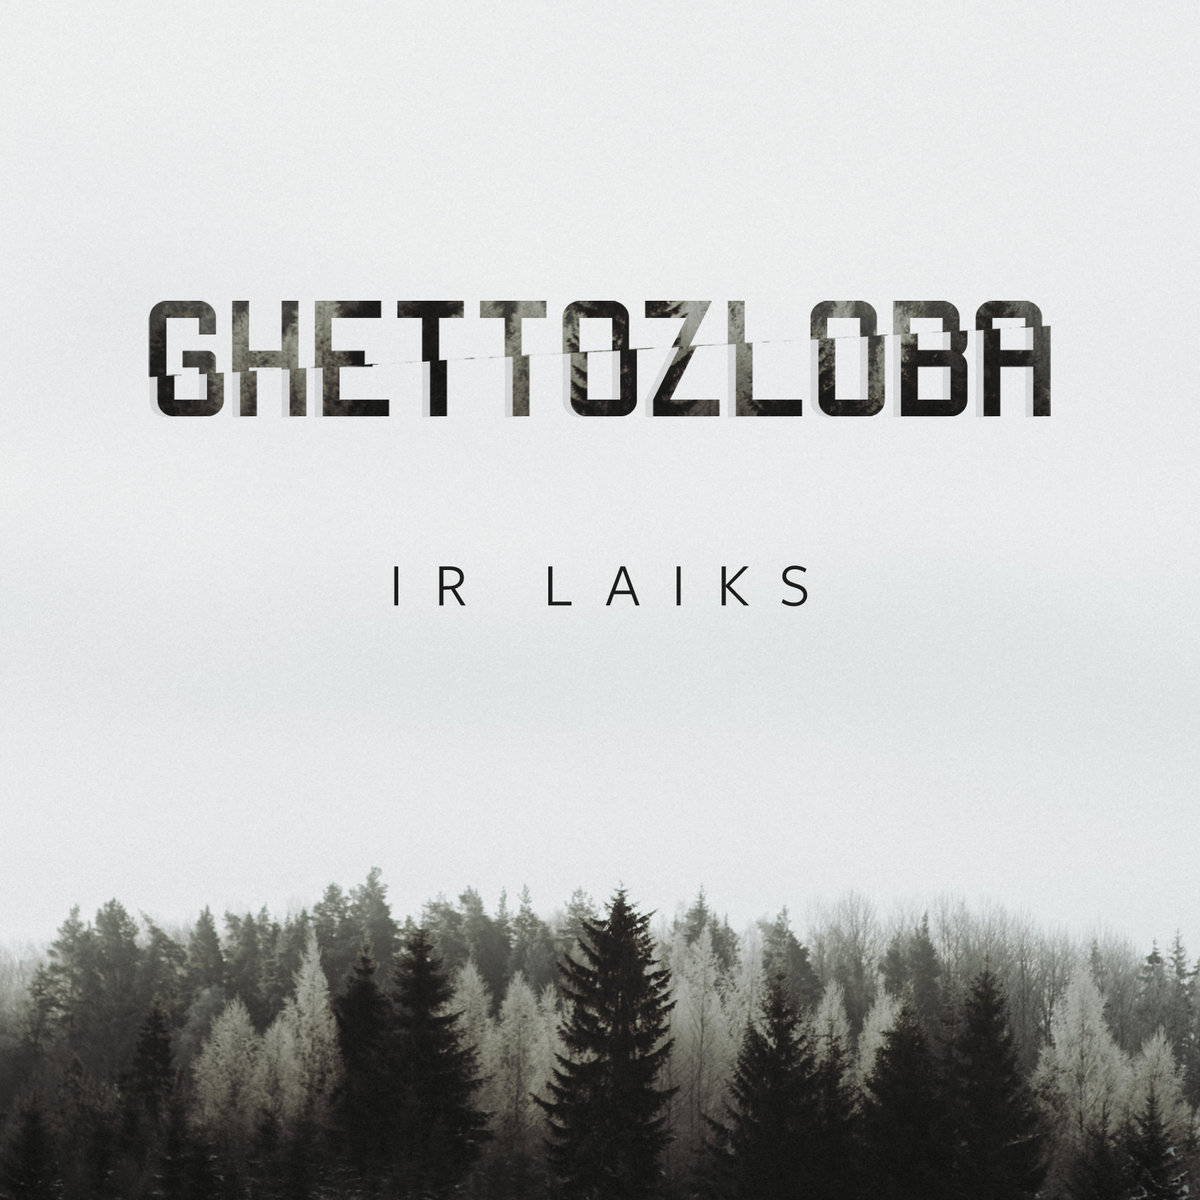 Ghettozloba - Ir Laiks [EP] (2018)